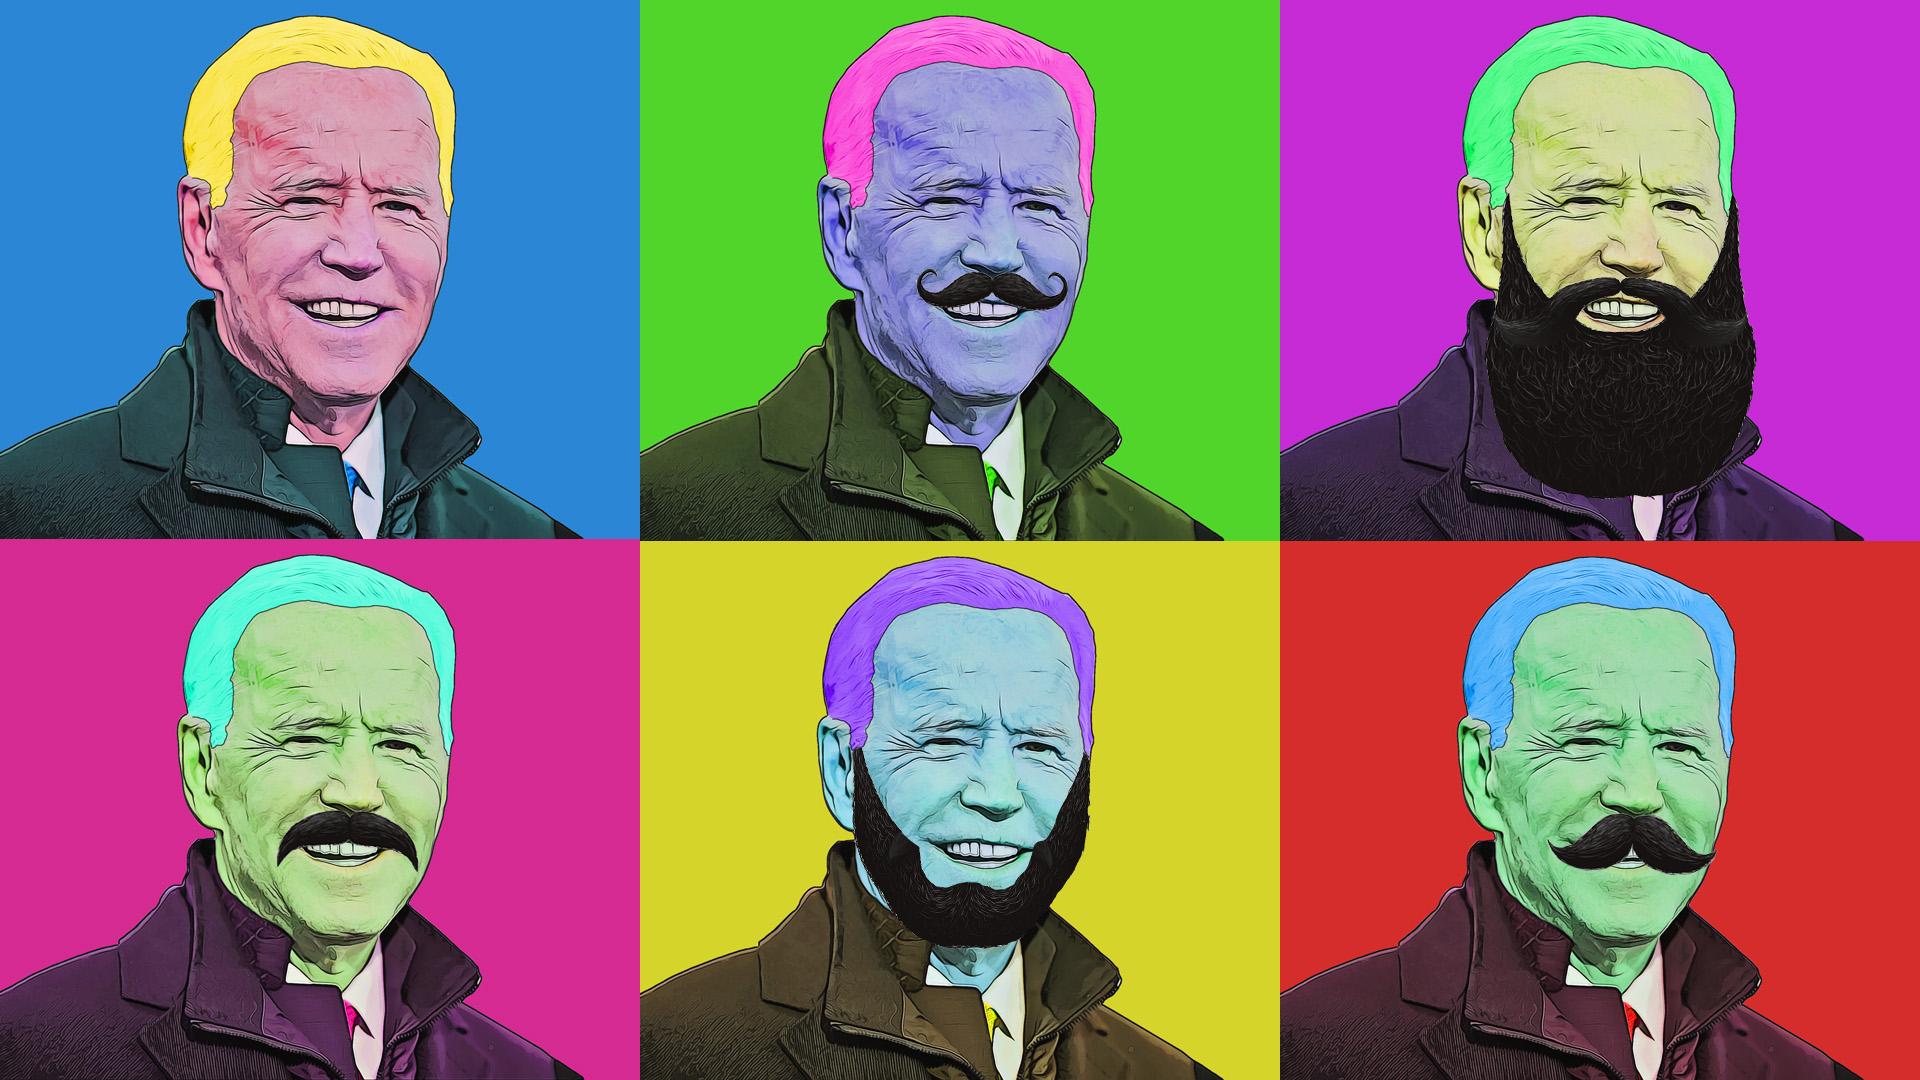 Biden is előrukkolhat valamivel januárig